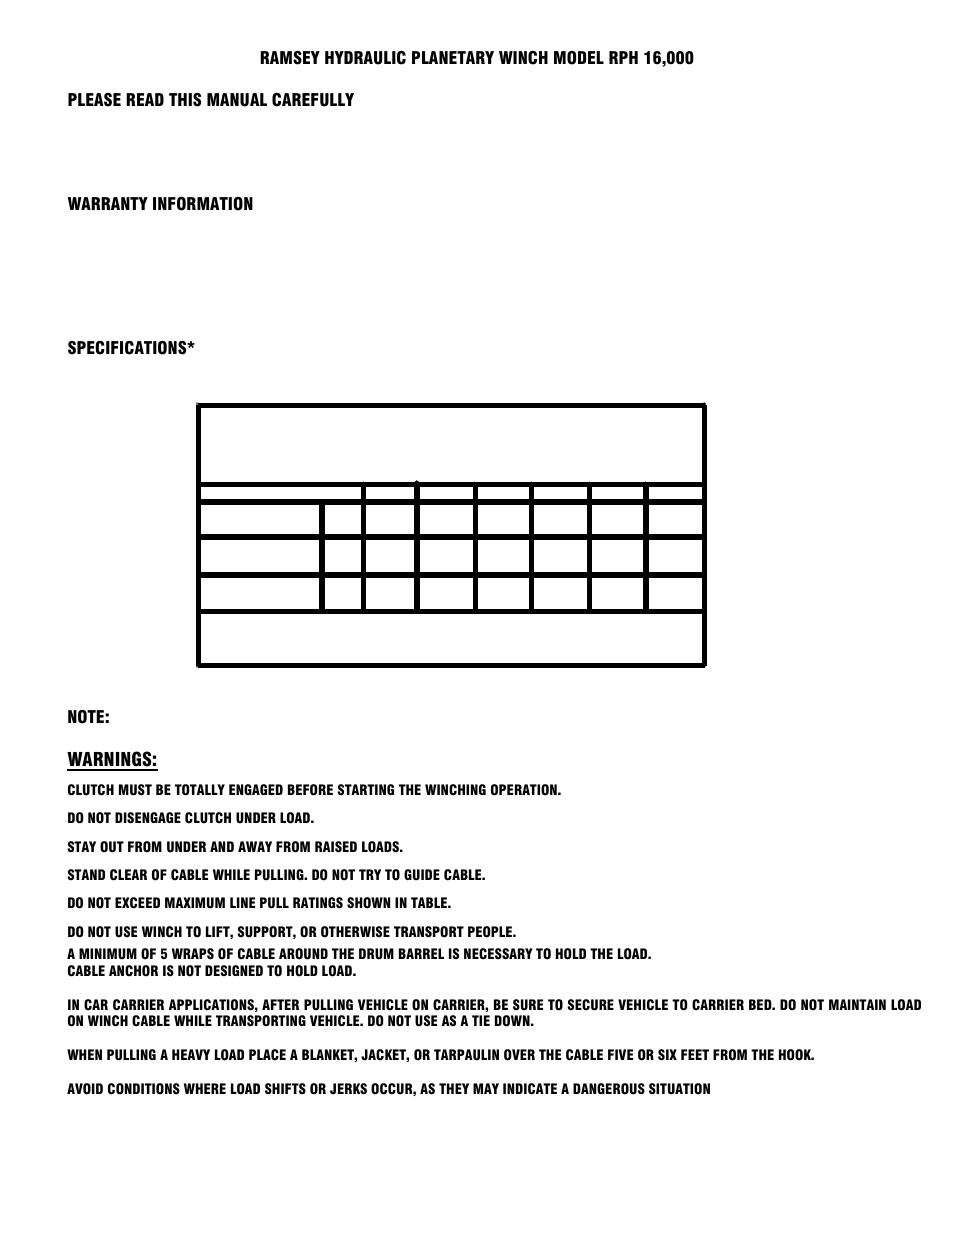 Warnings | Ramsey Winch RPH-16000 User Manual | Page 3 / 20